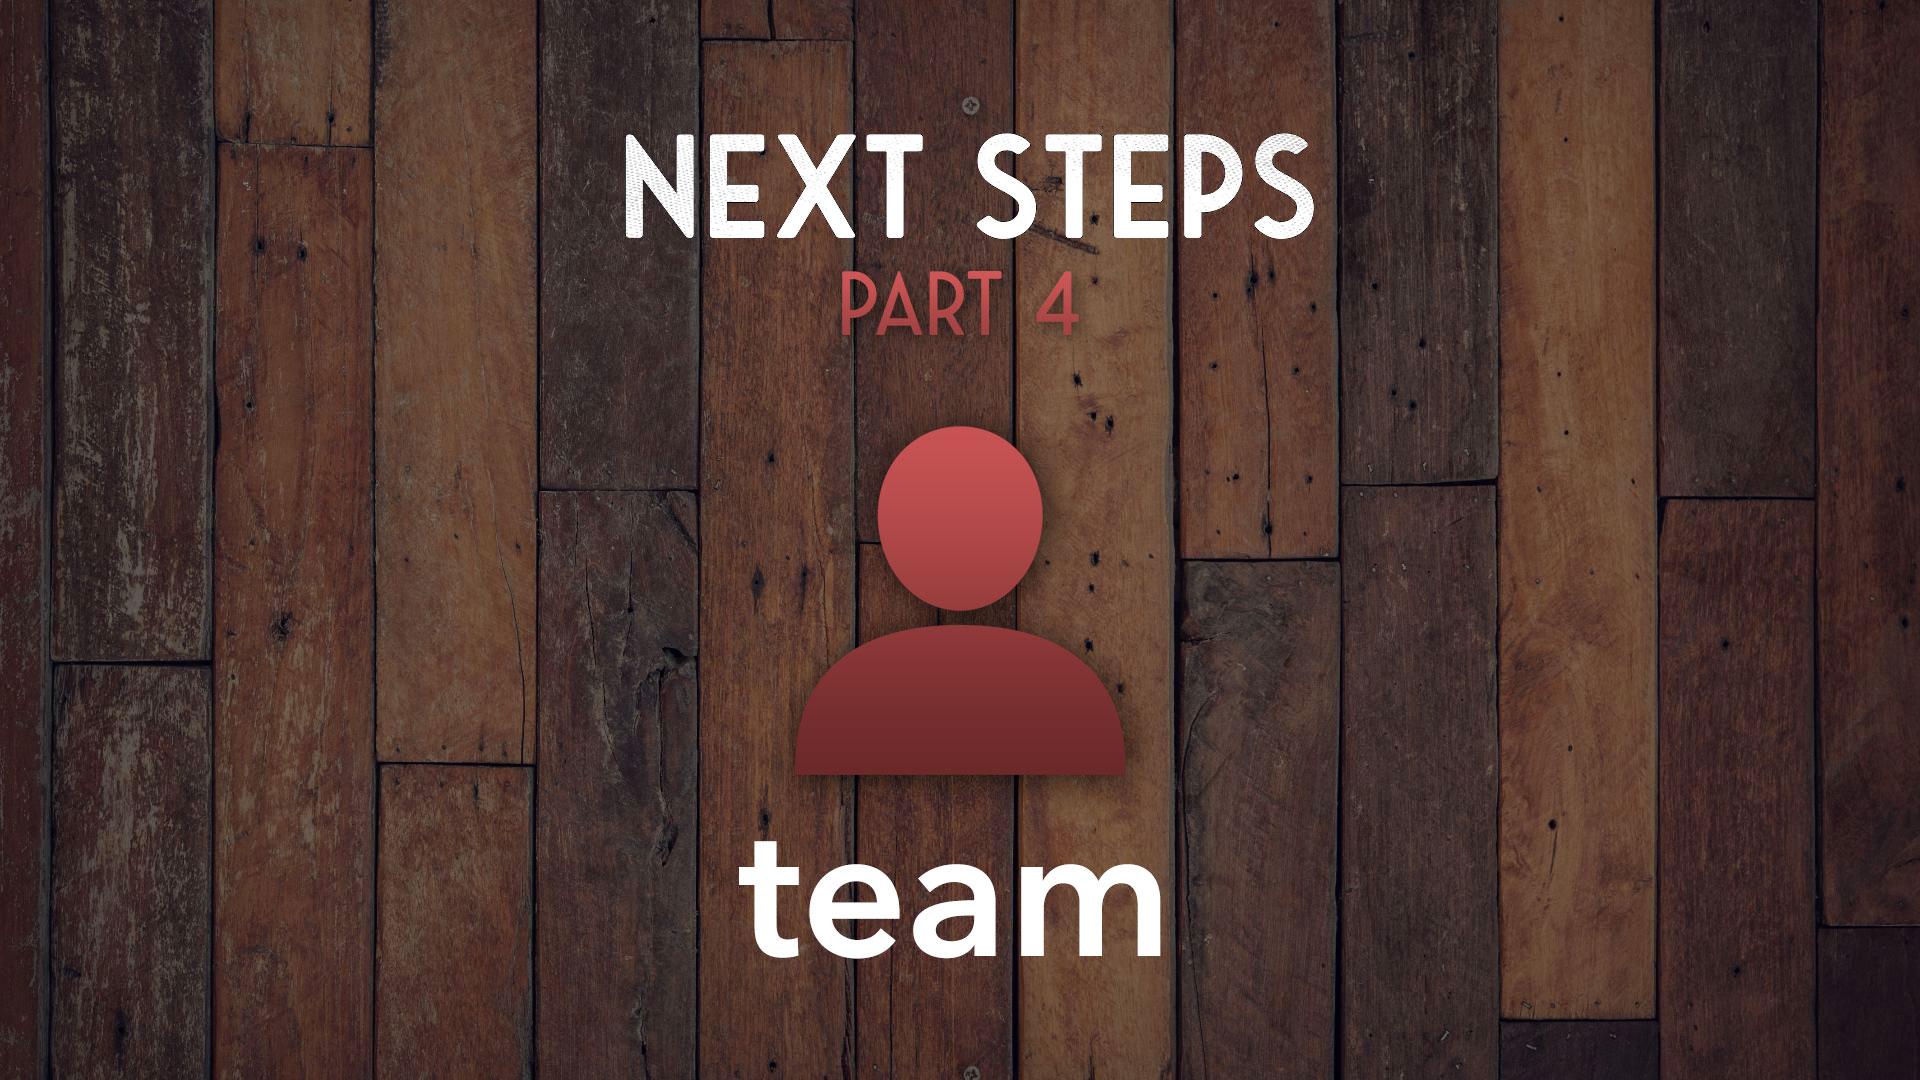 Next Steps Part 4